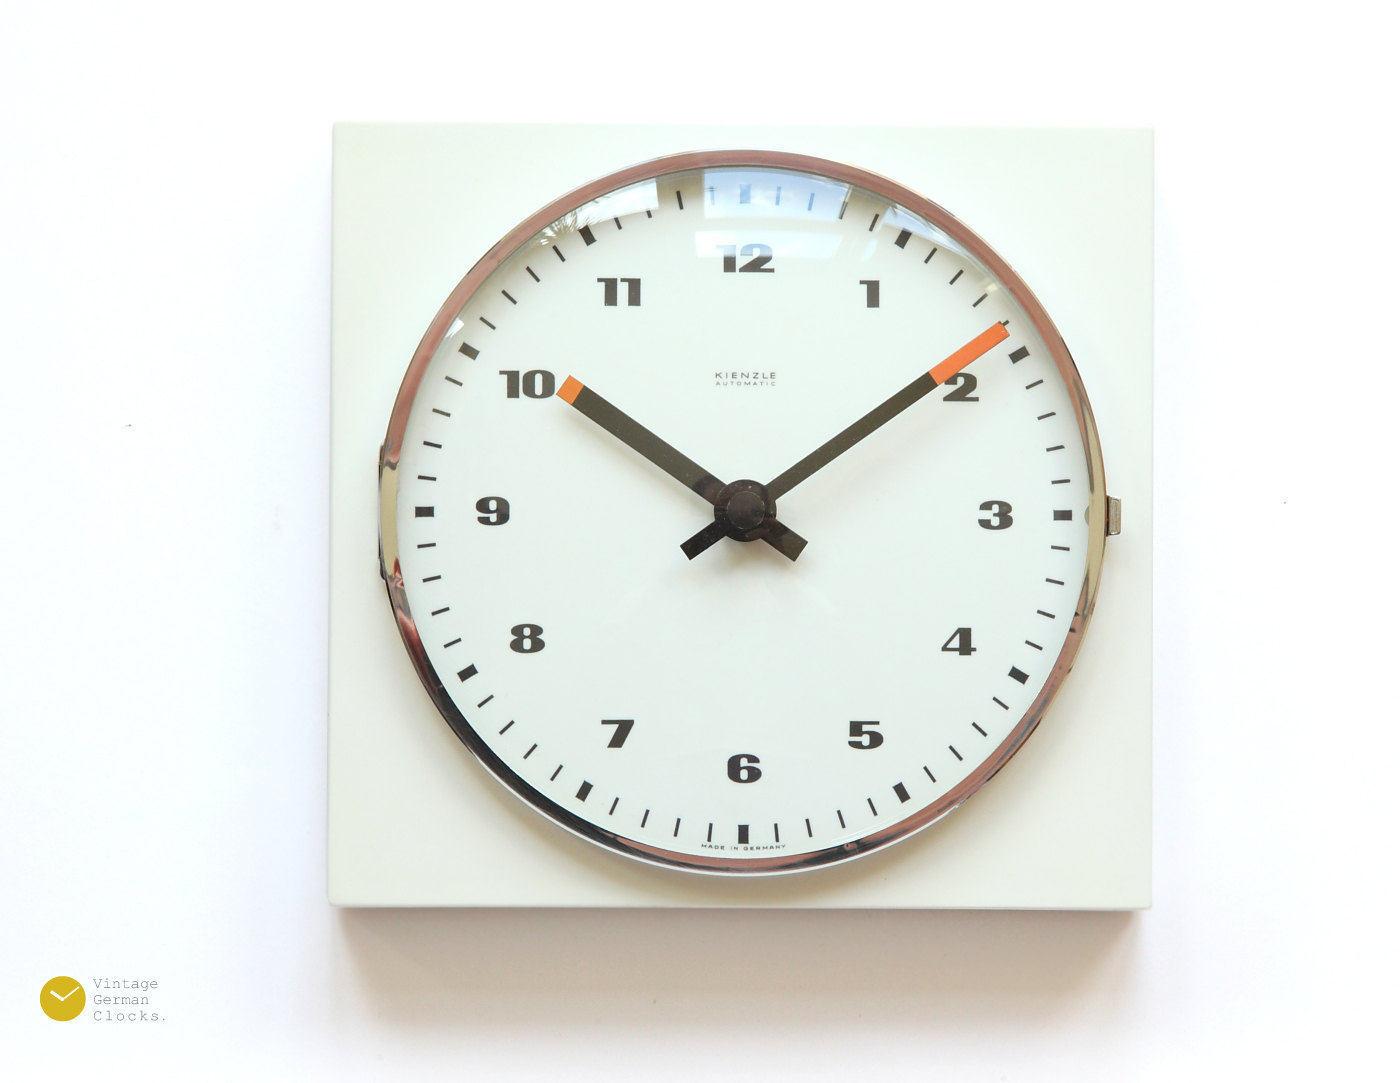 space age kienzle wall clock bauhaus panton minimal modern